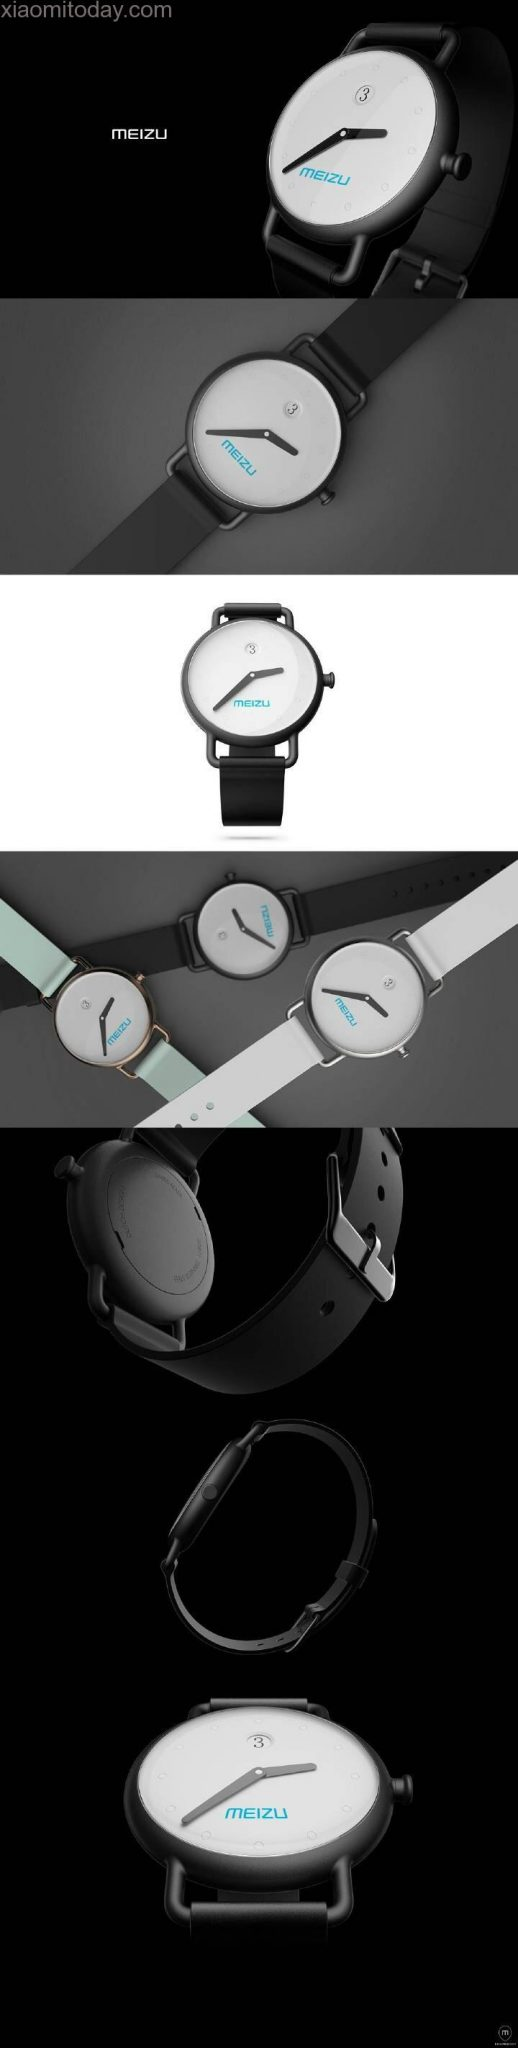 meizu-smartwatch-different-colors